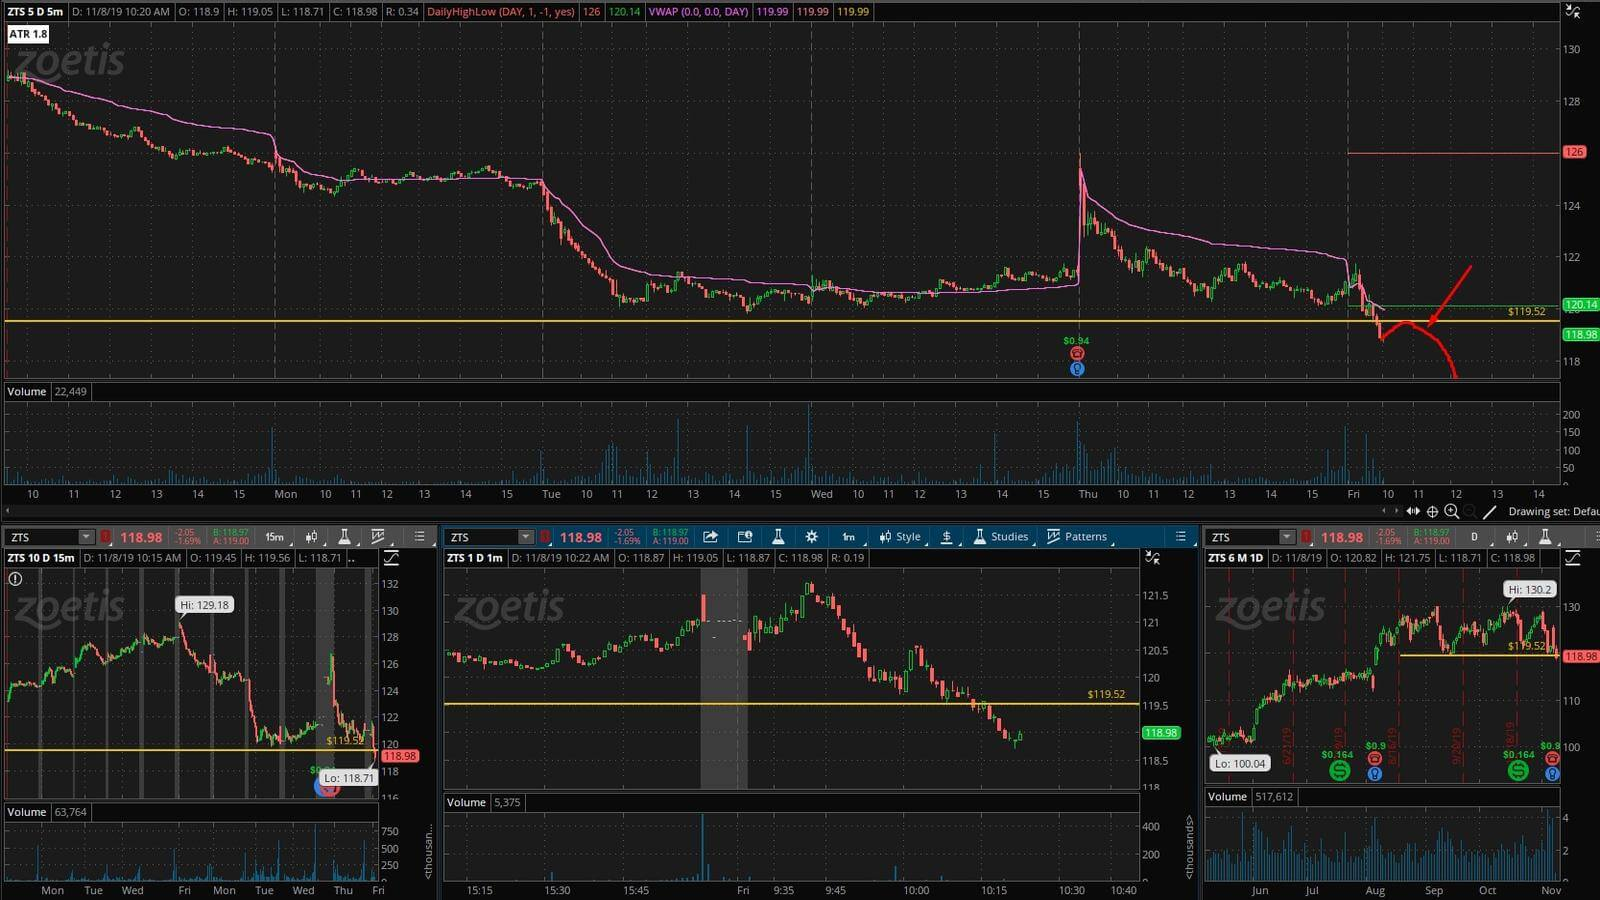 ZTS - график акции на фондовой бирже